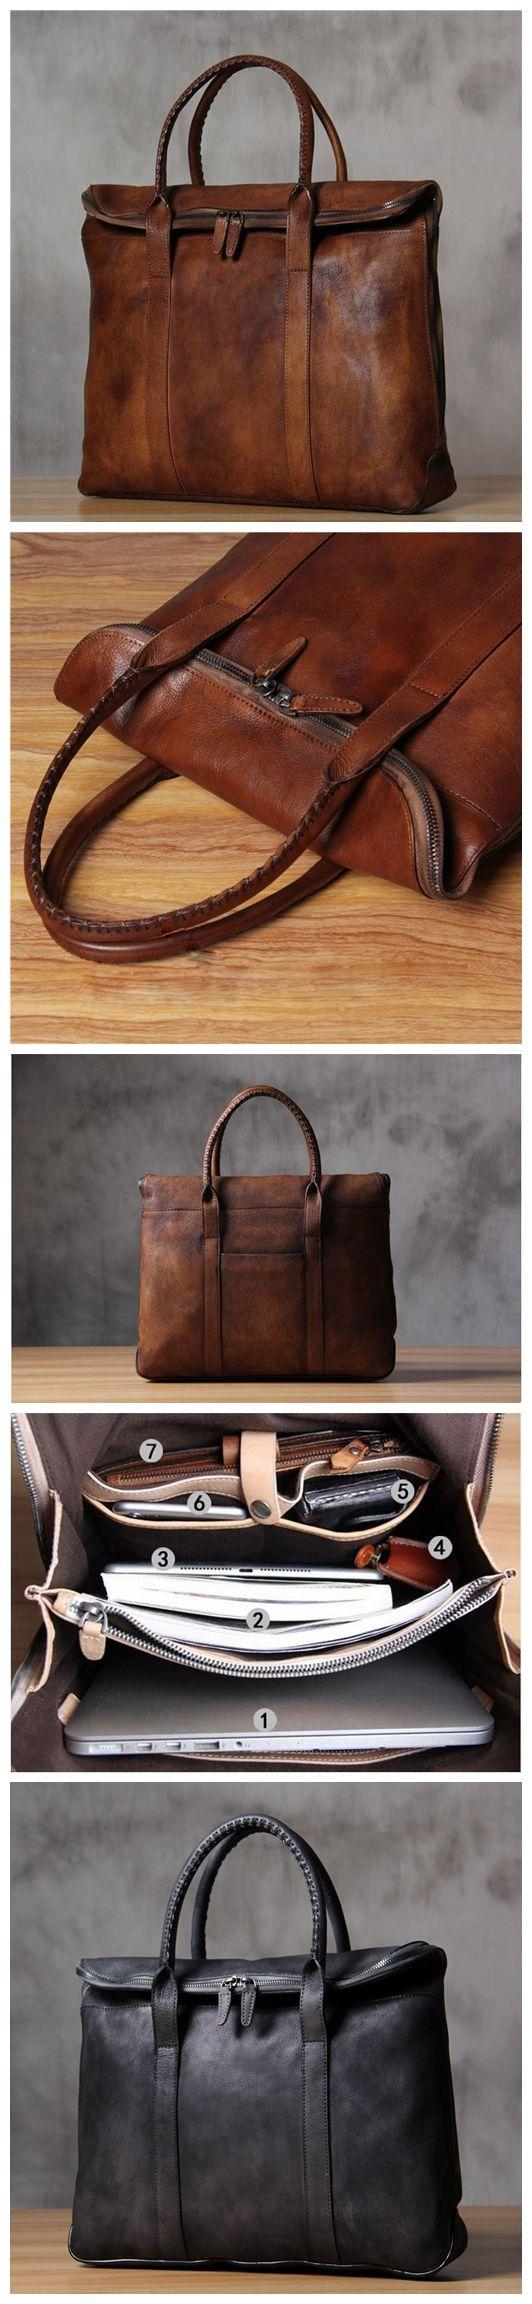 ROCKCOW Italian Leather Men's Leather Laptop Bag Briefcase Messenger Bag 9069